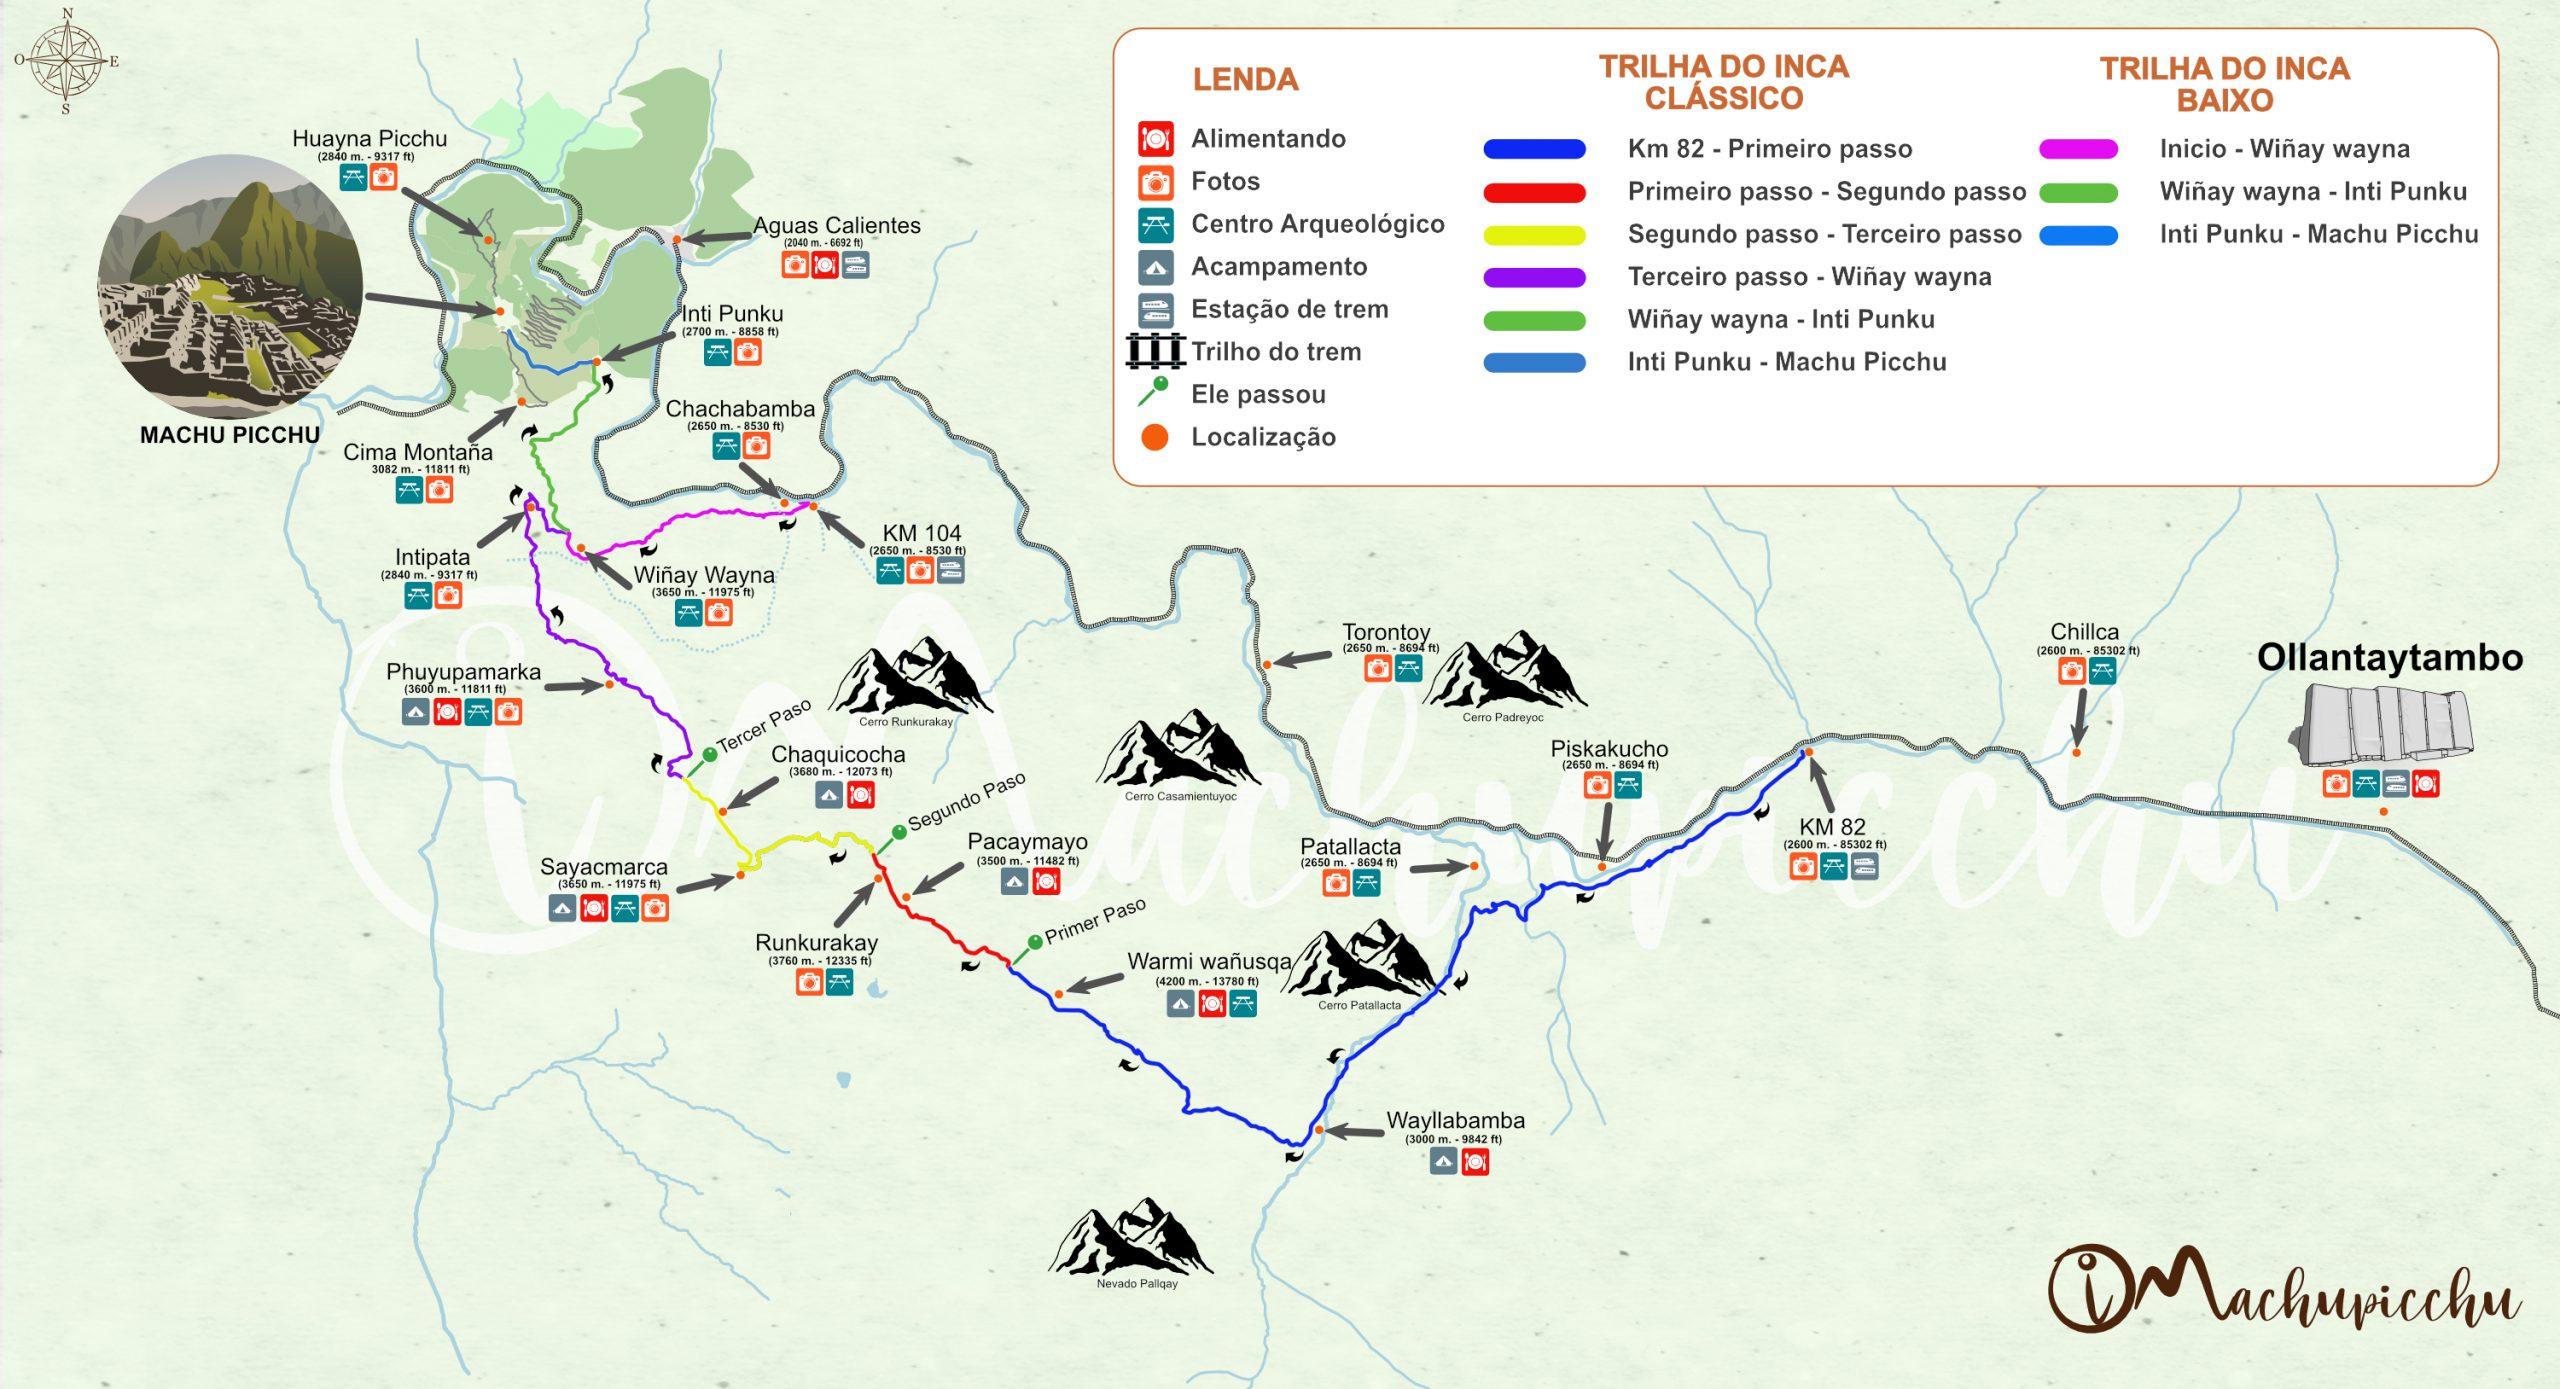 trilha-Inca-completa-br-full